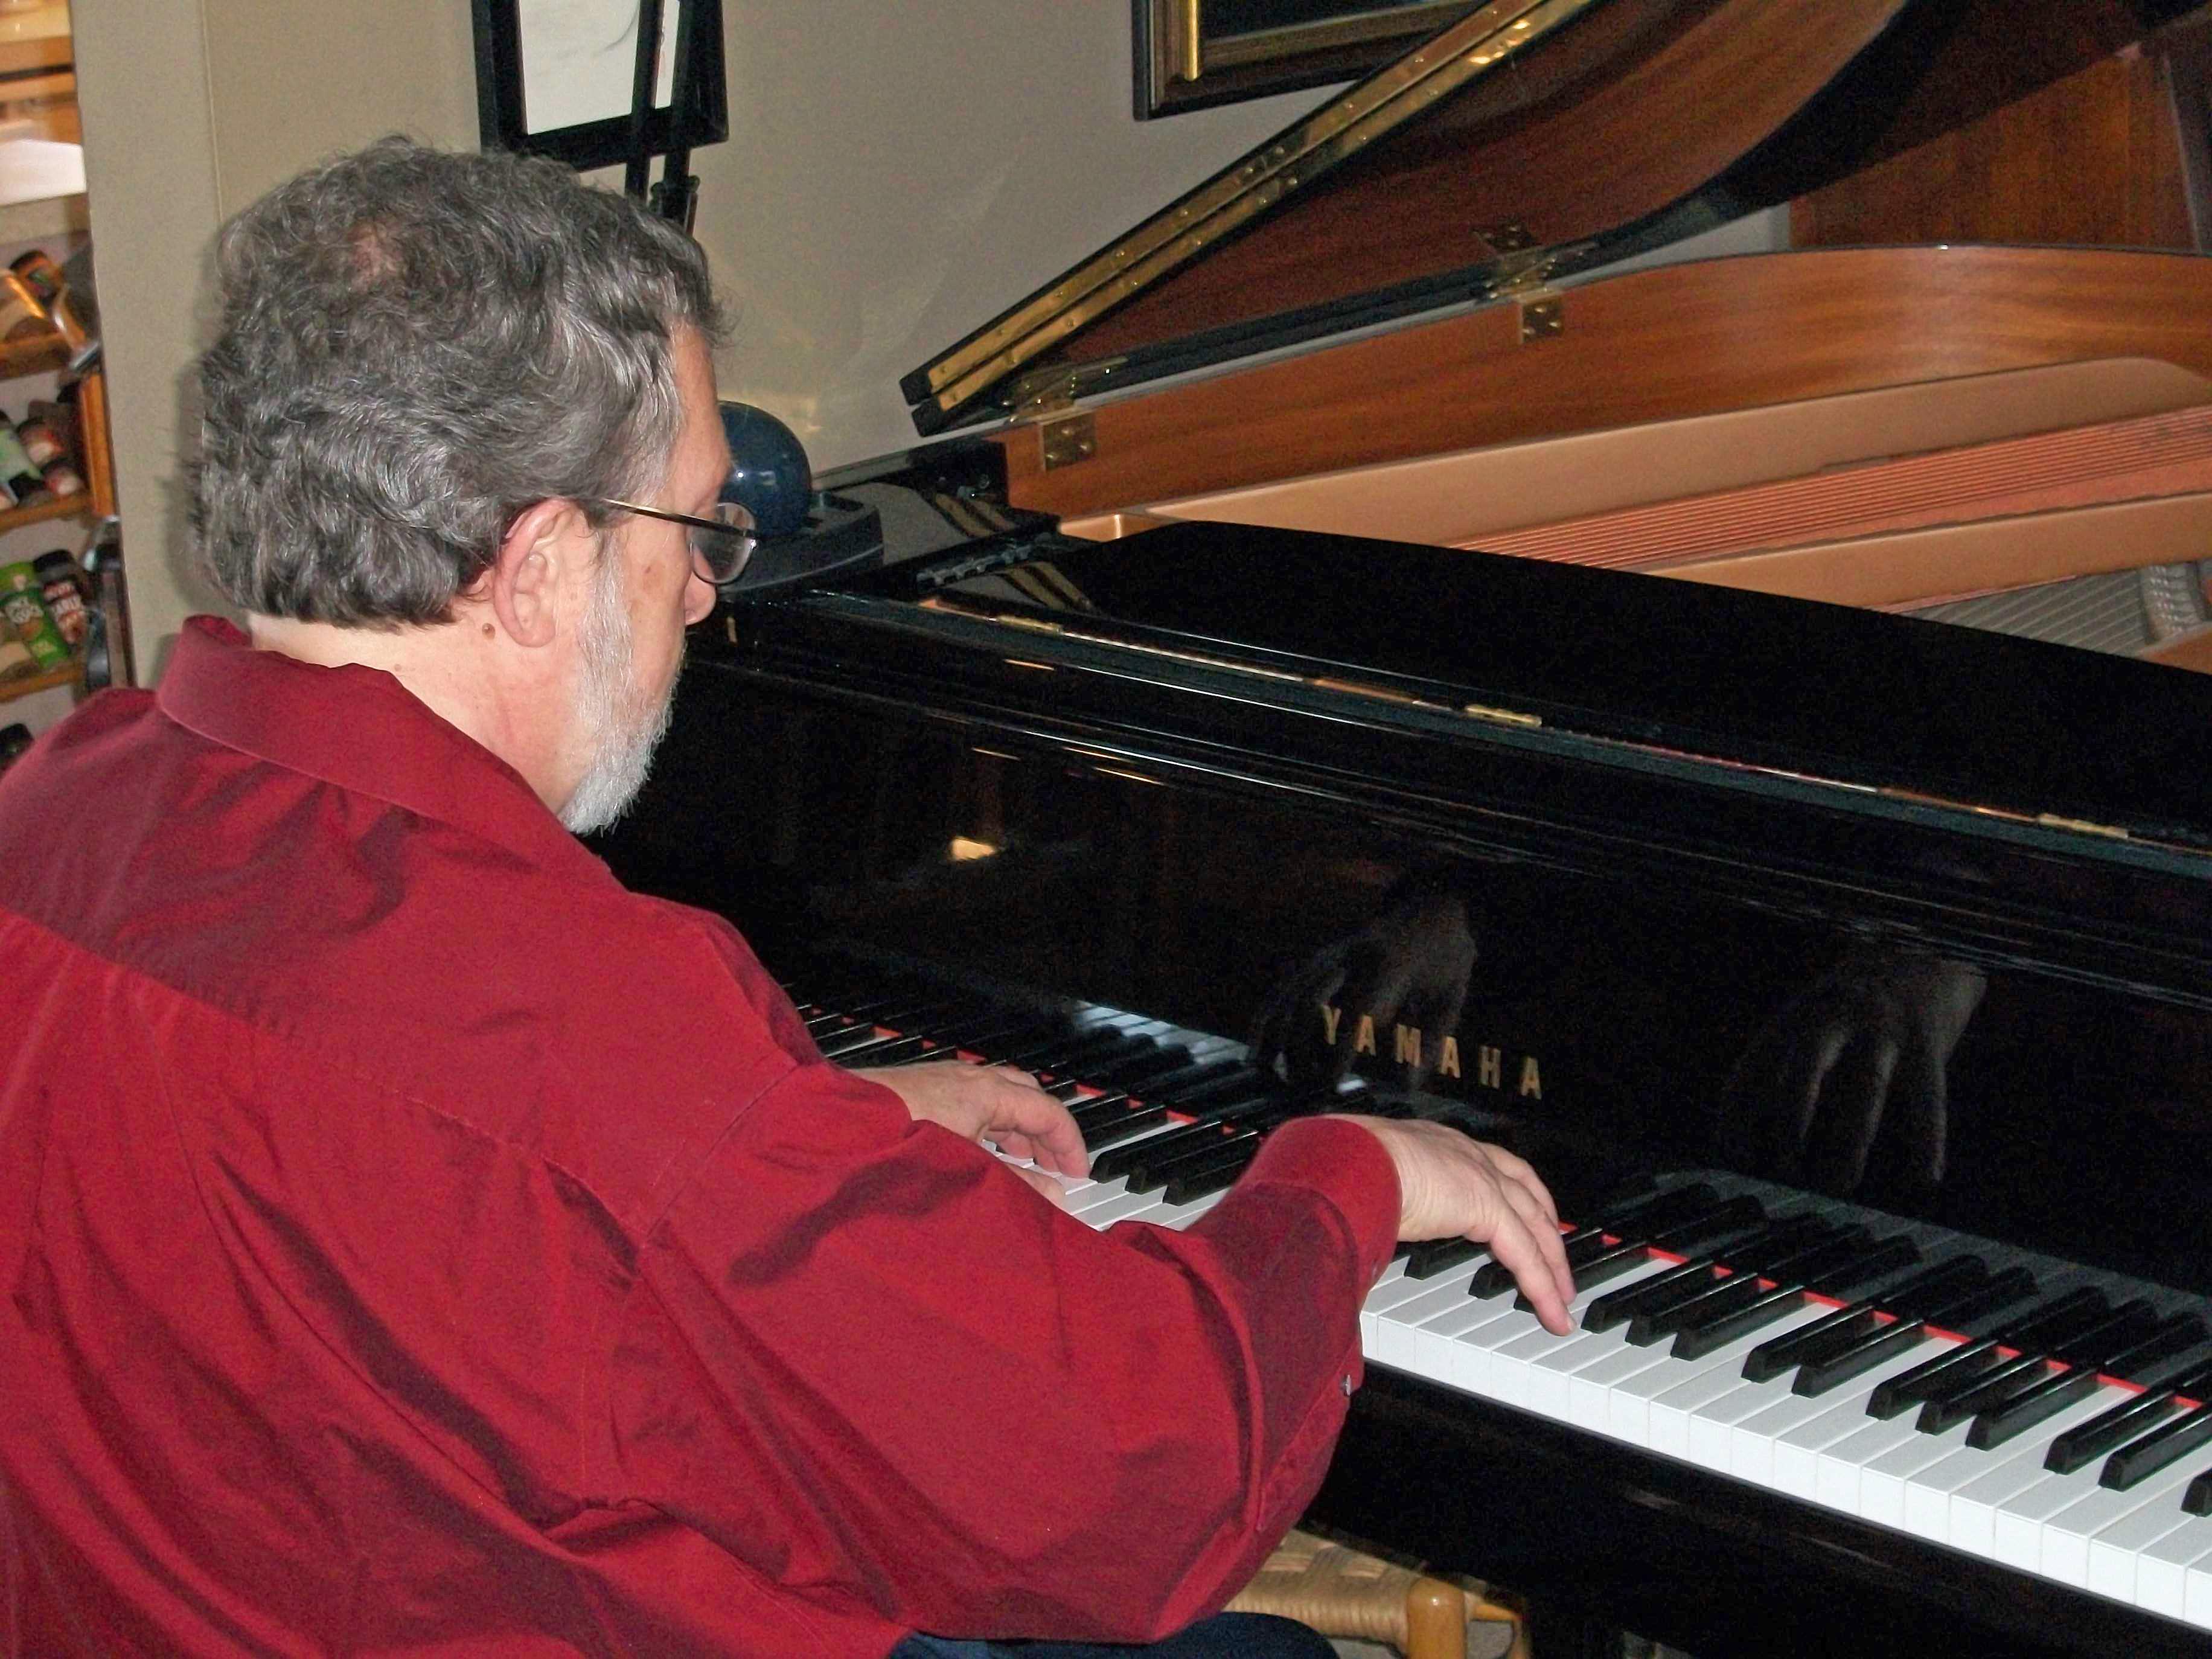 Grover Farr, Music Teacher, playing piano